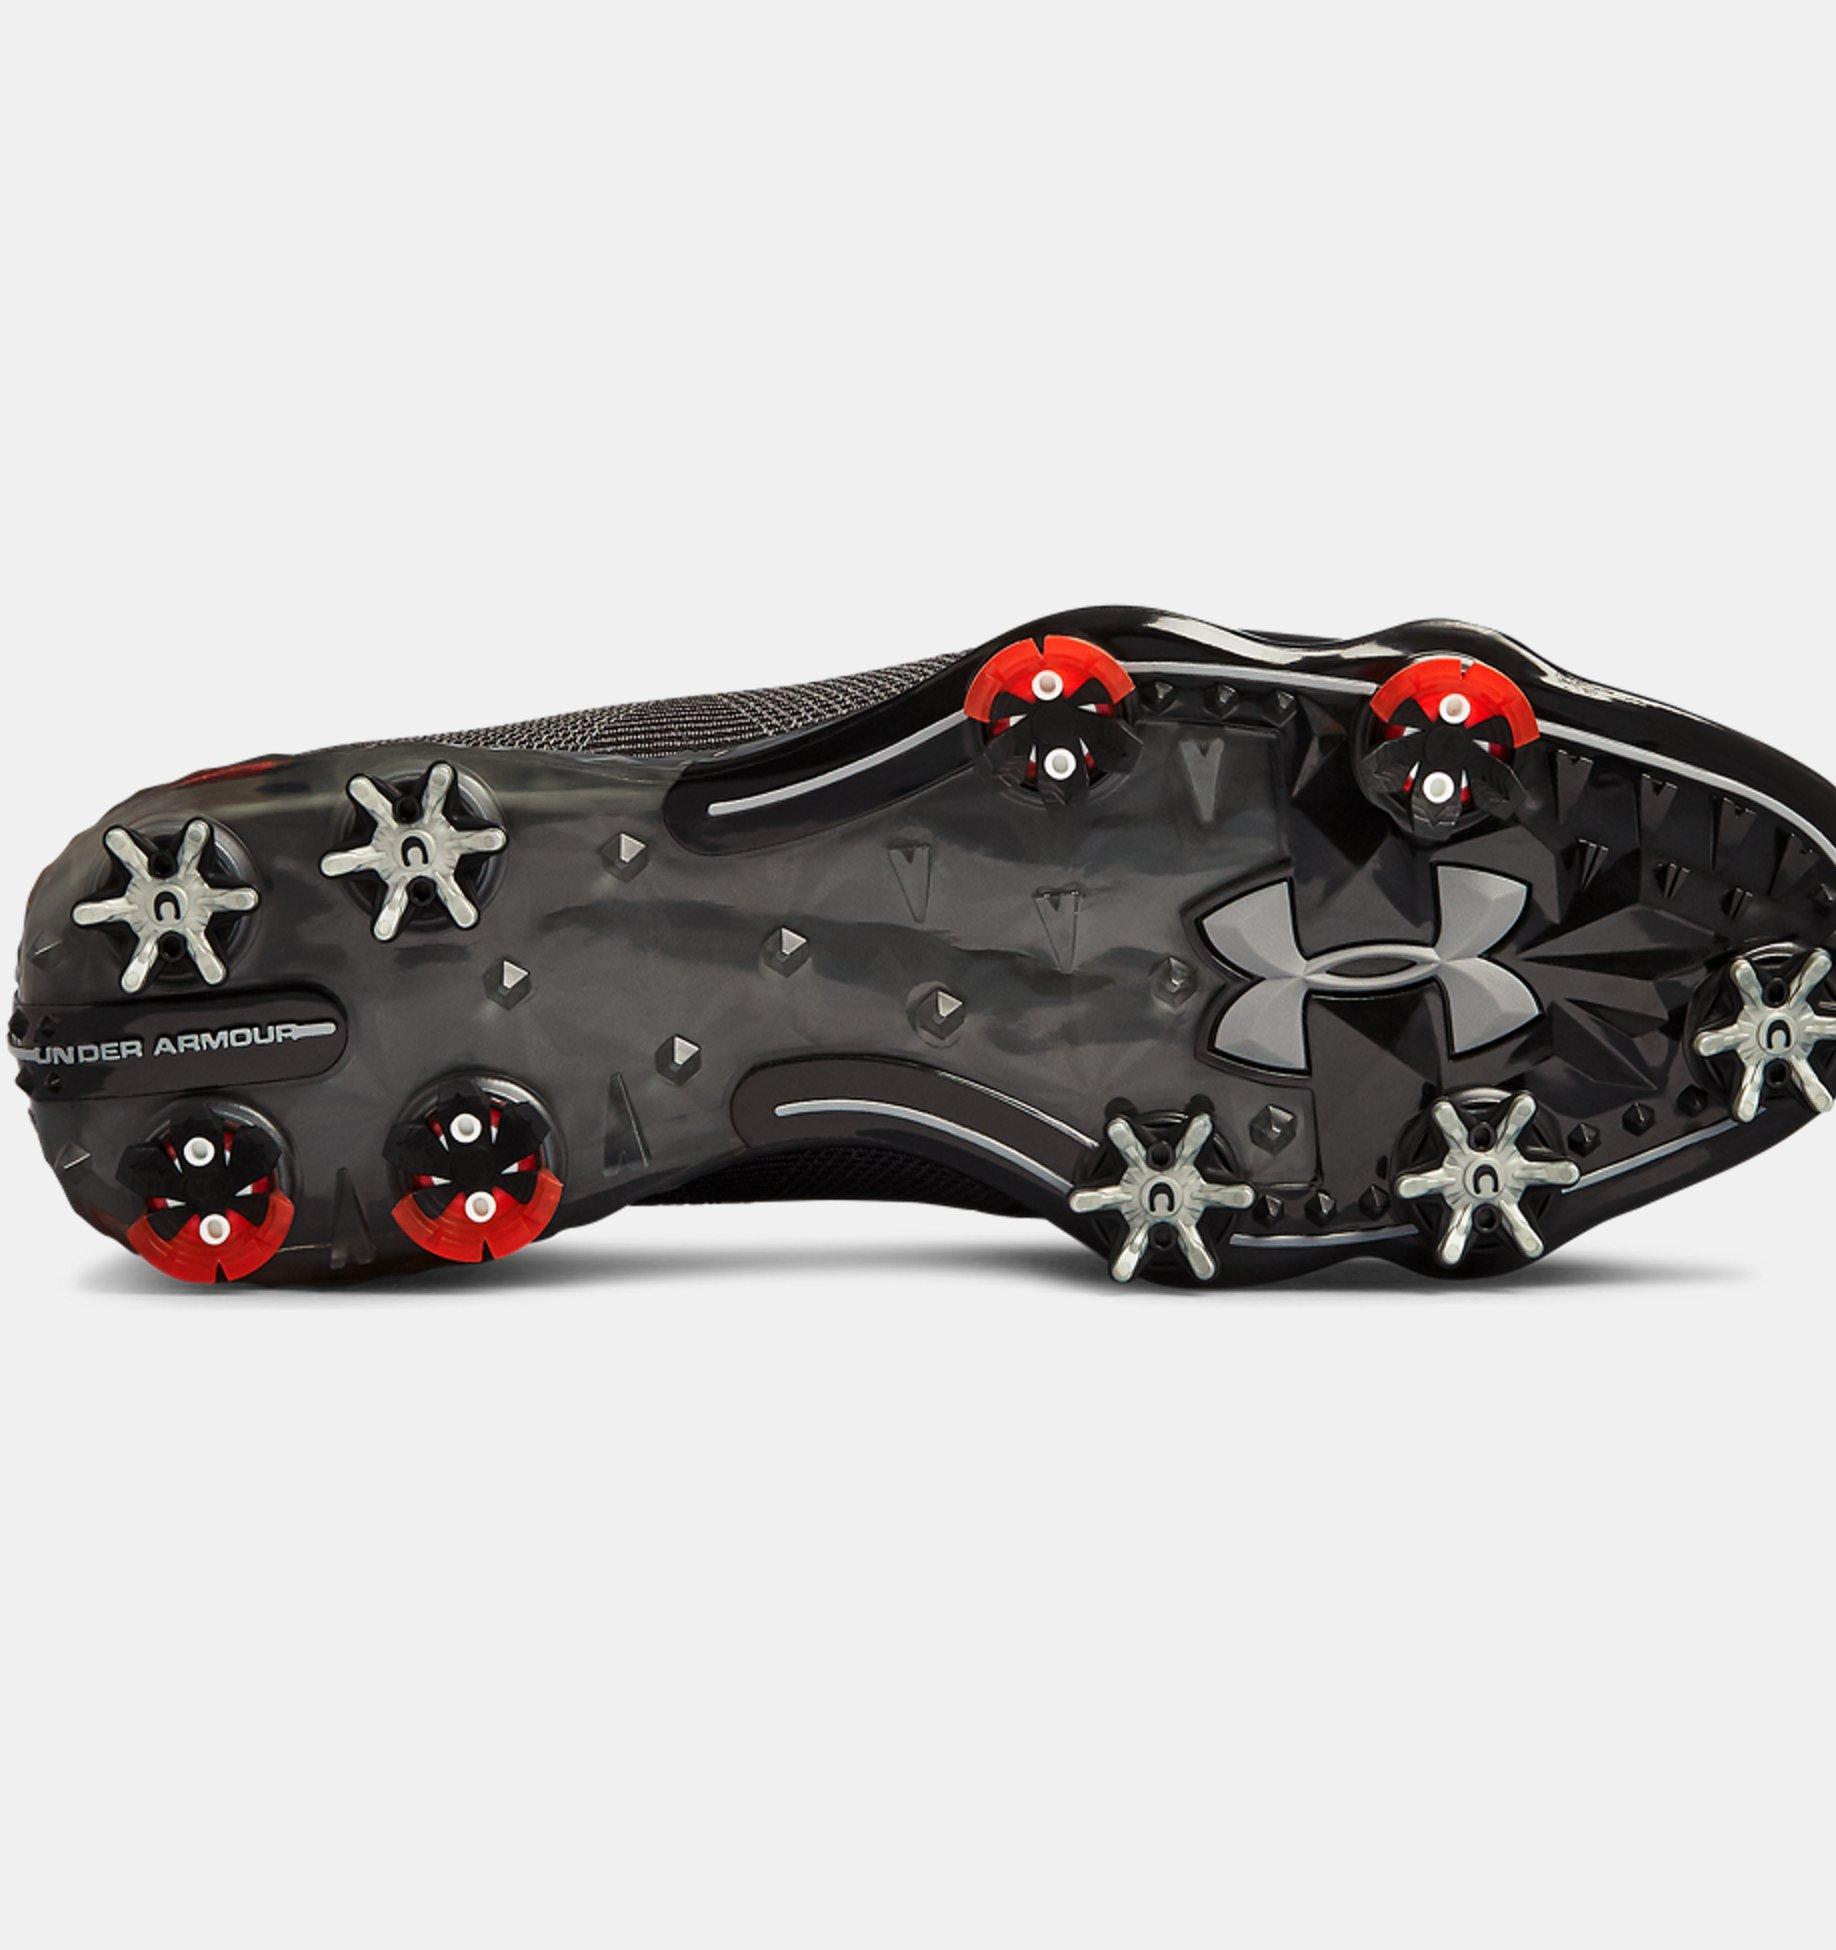 Injusto Ejecutar Cien años  Men's UA Spieth 2 Mid Golf Shoes | Under Armour AT